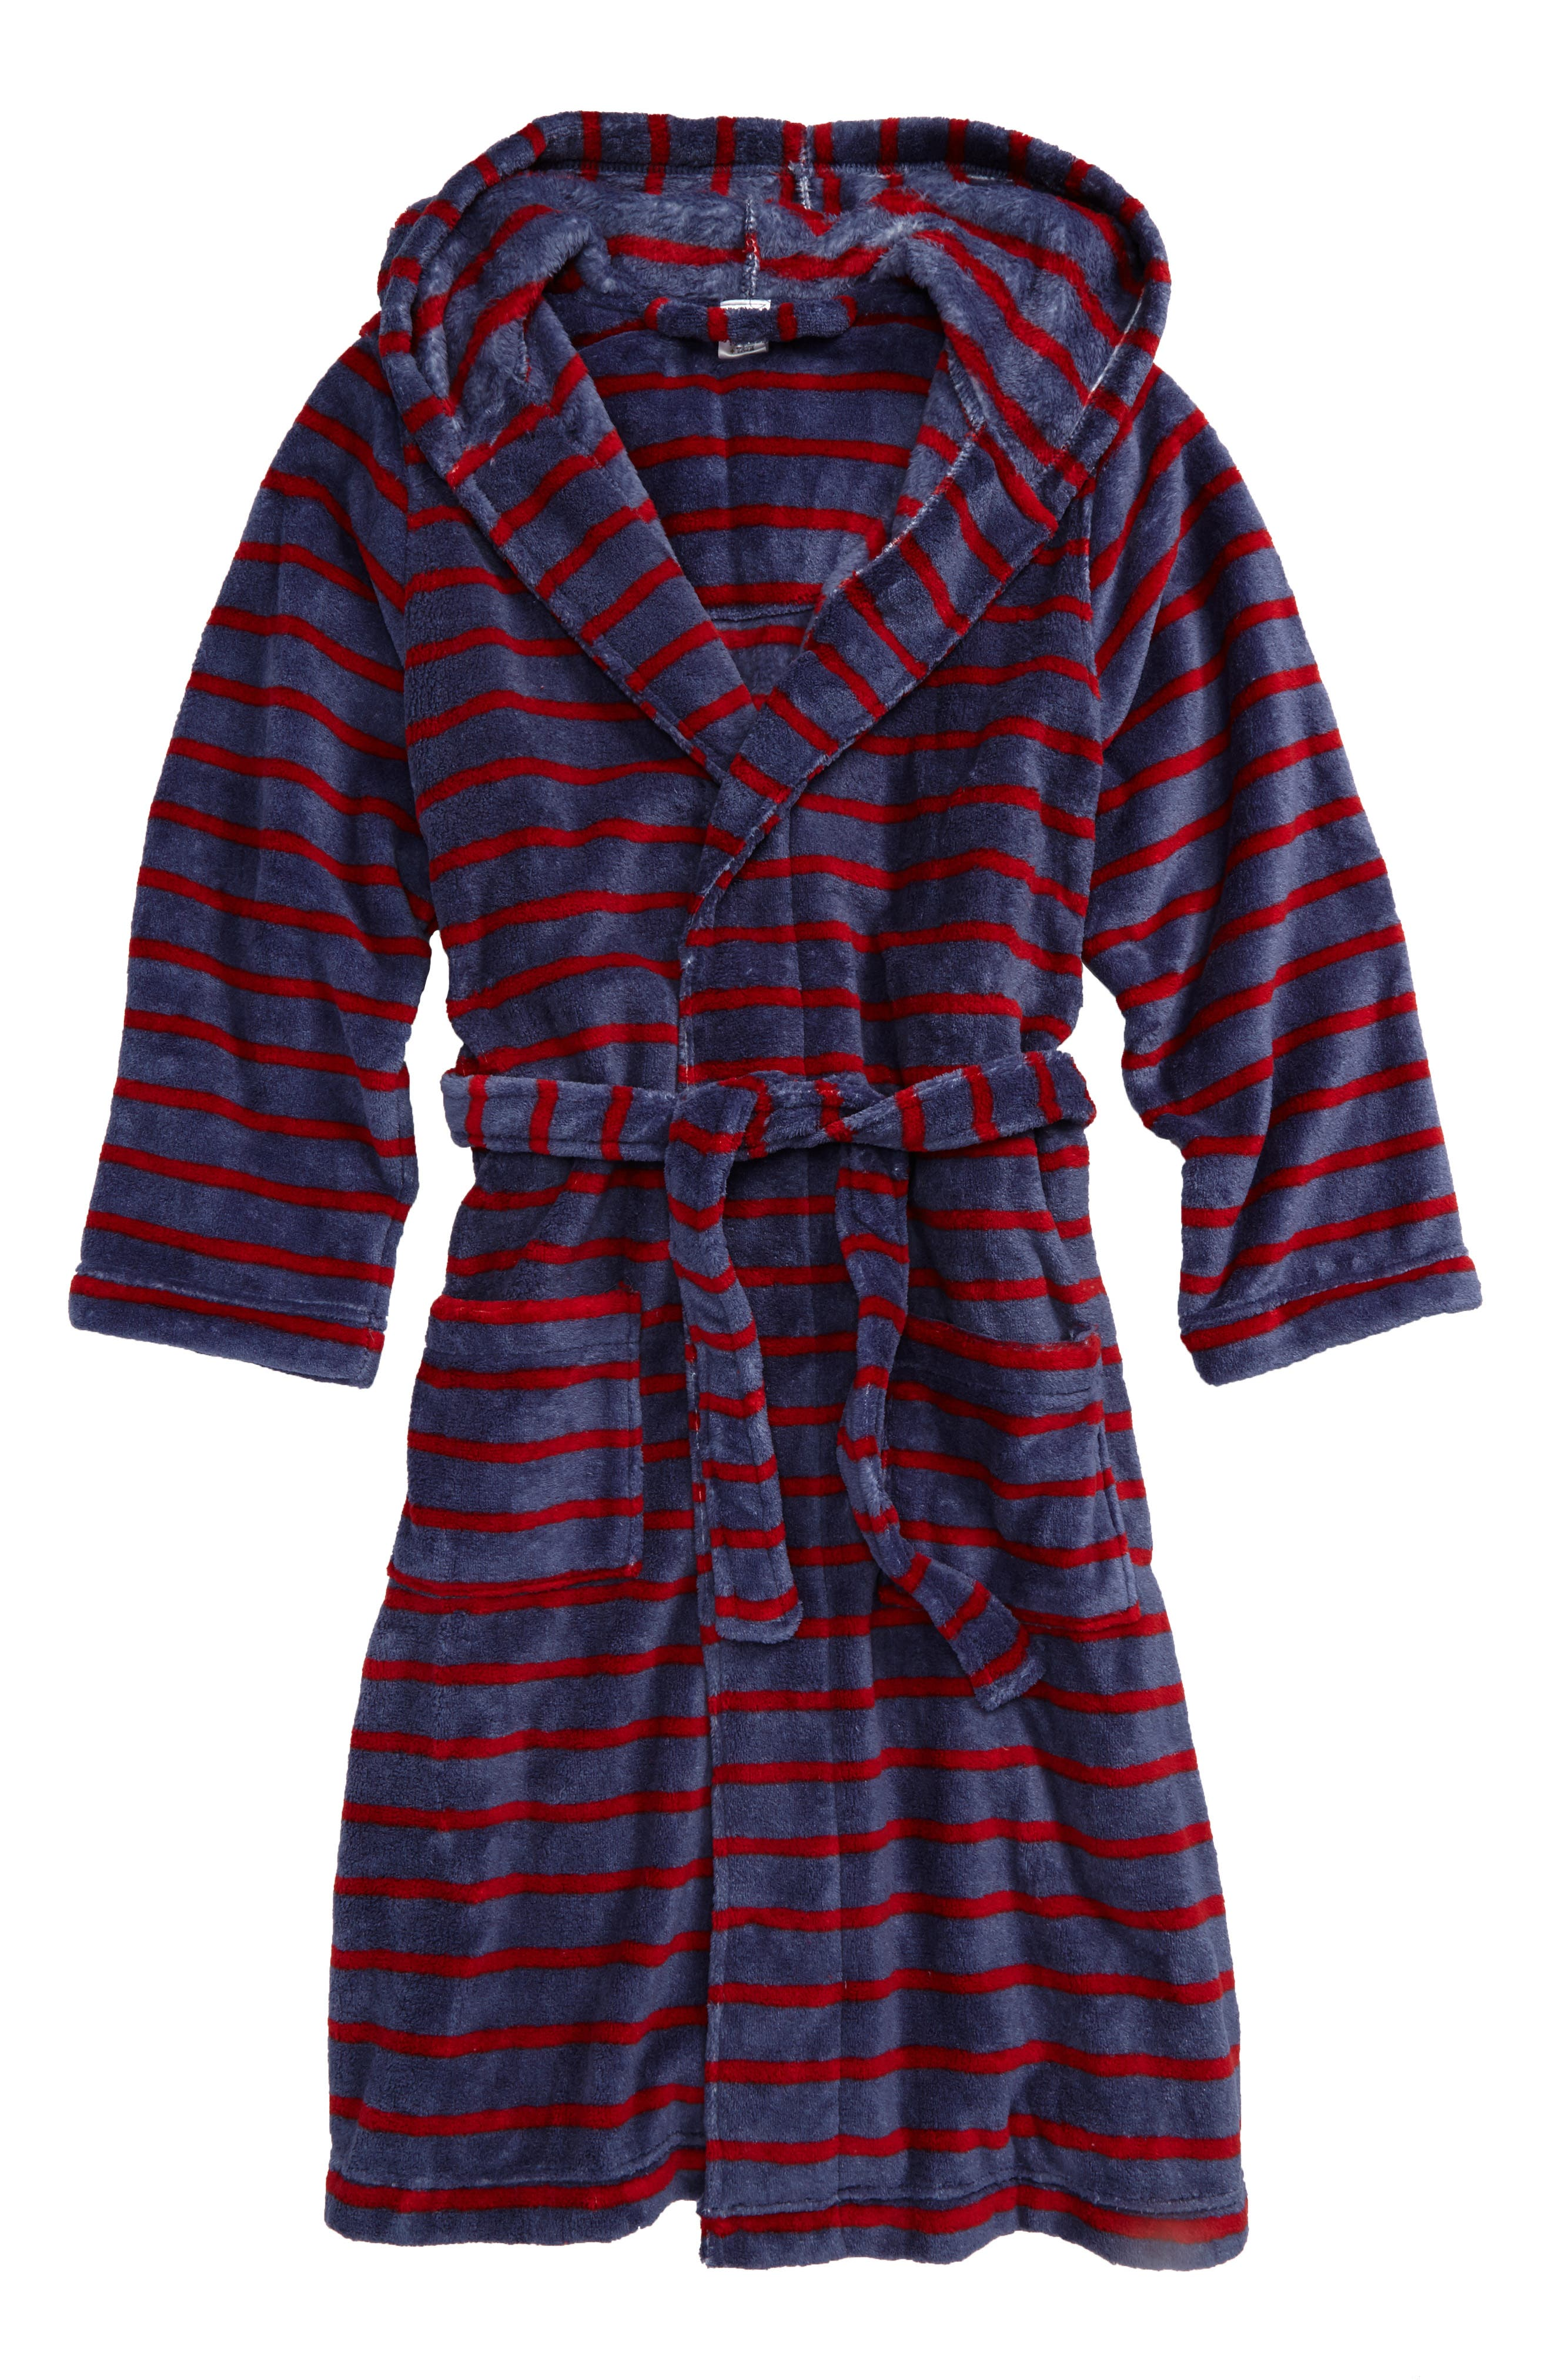 Red dress 5t robe